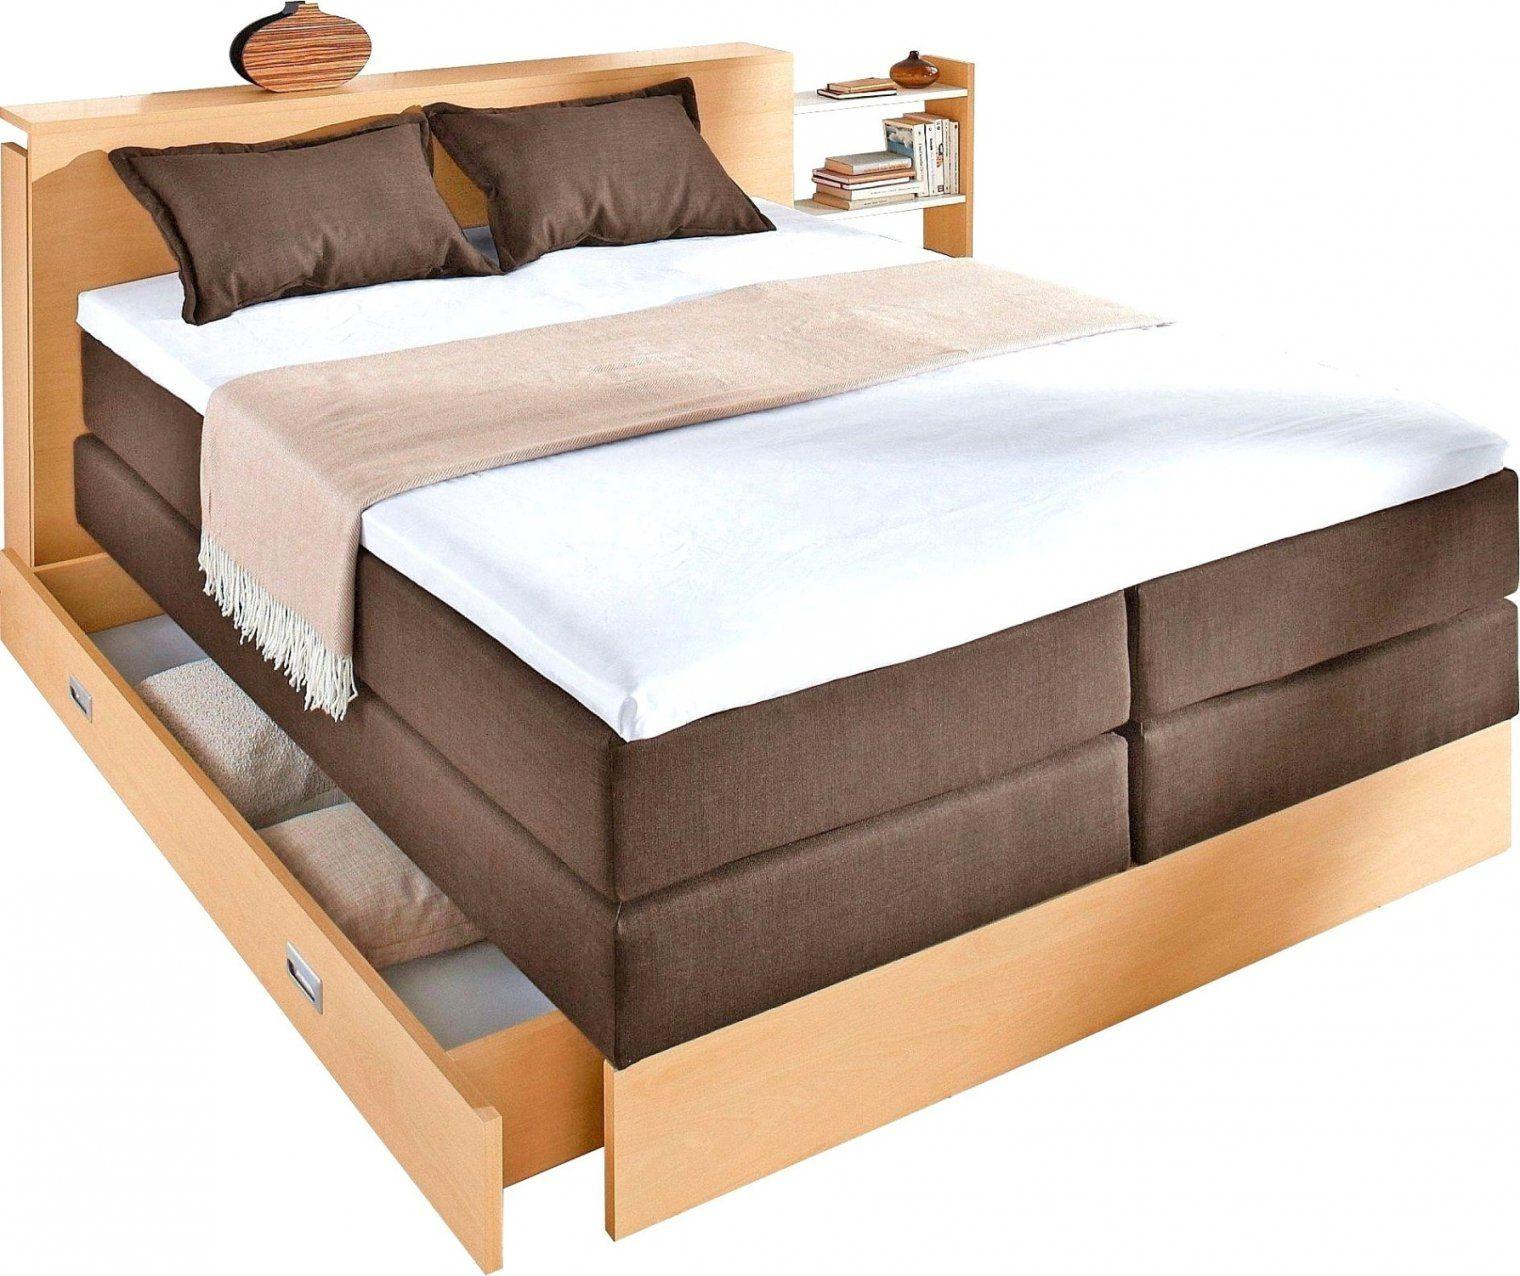 Neueste Beautifully Idea Breckle Betten Polsterbett Bett Mit Zum von Otto Polsterbett Mit Bettkasten Bild